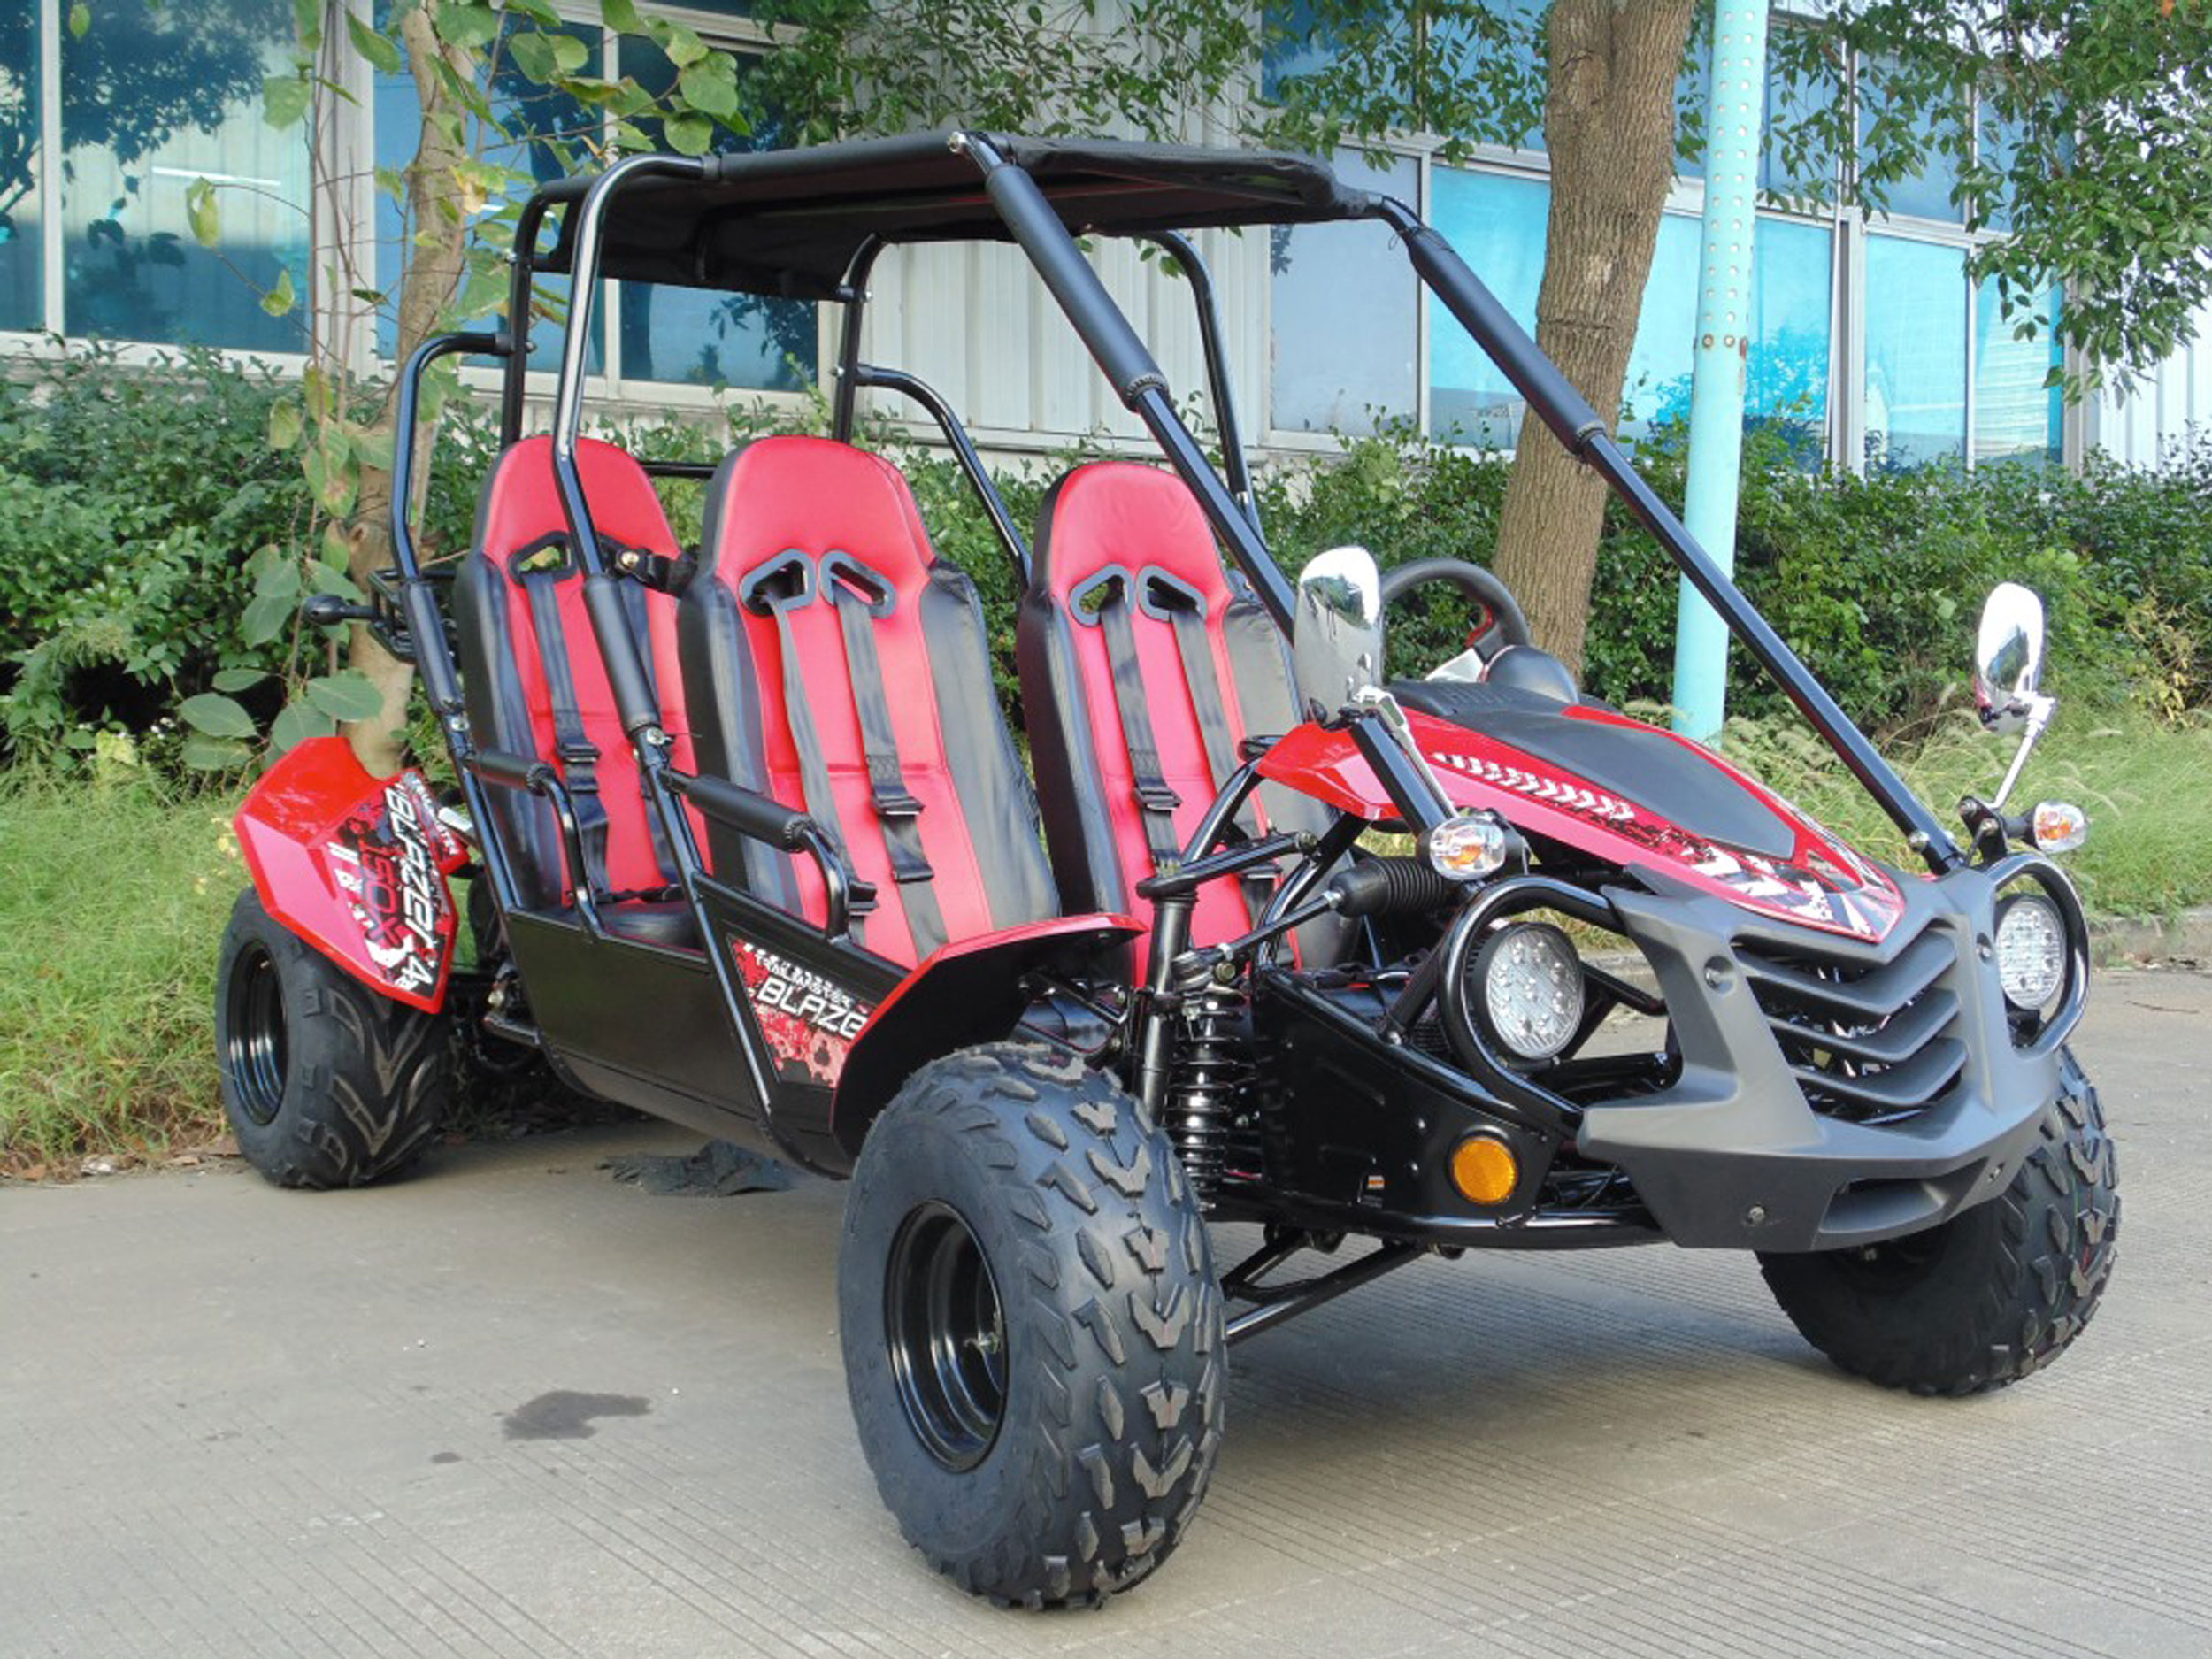 Trailmaster Blazer4 150 X (4-Seat Go Kart)